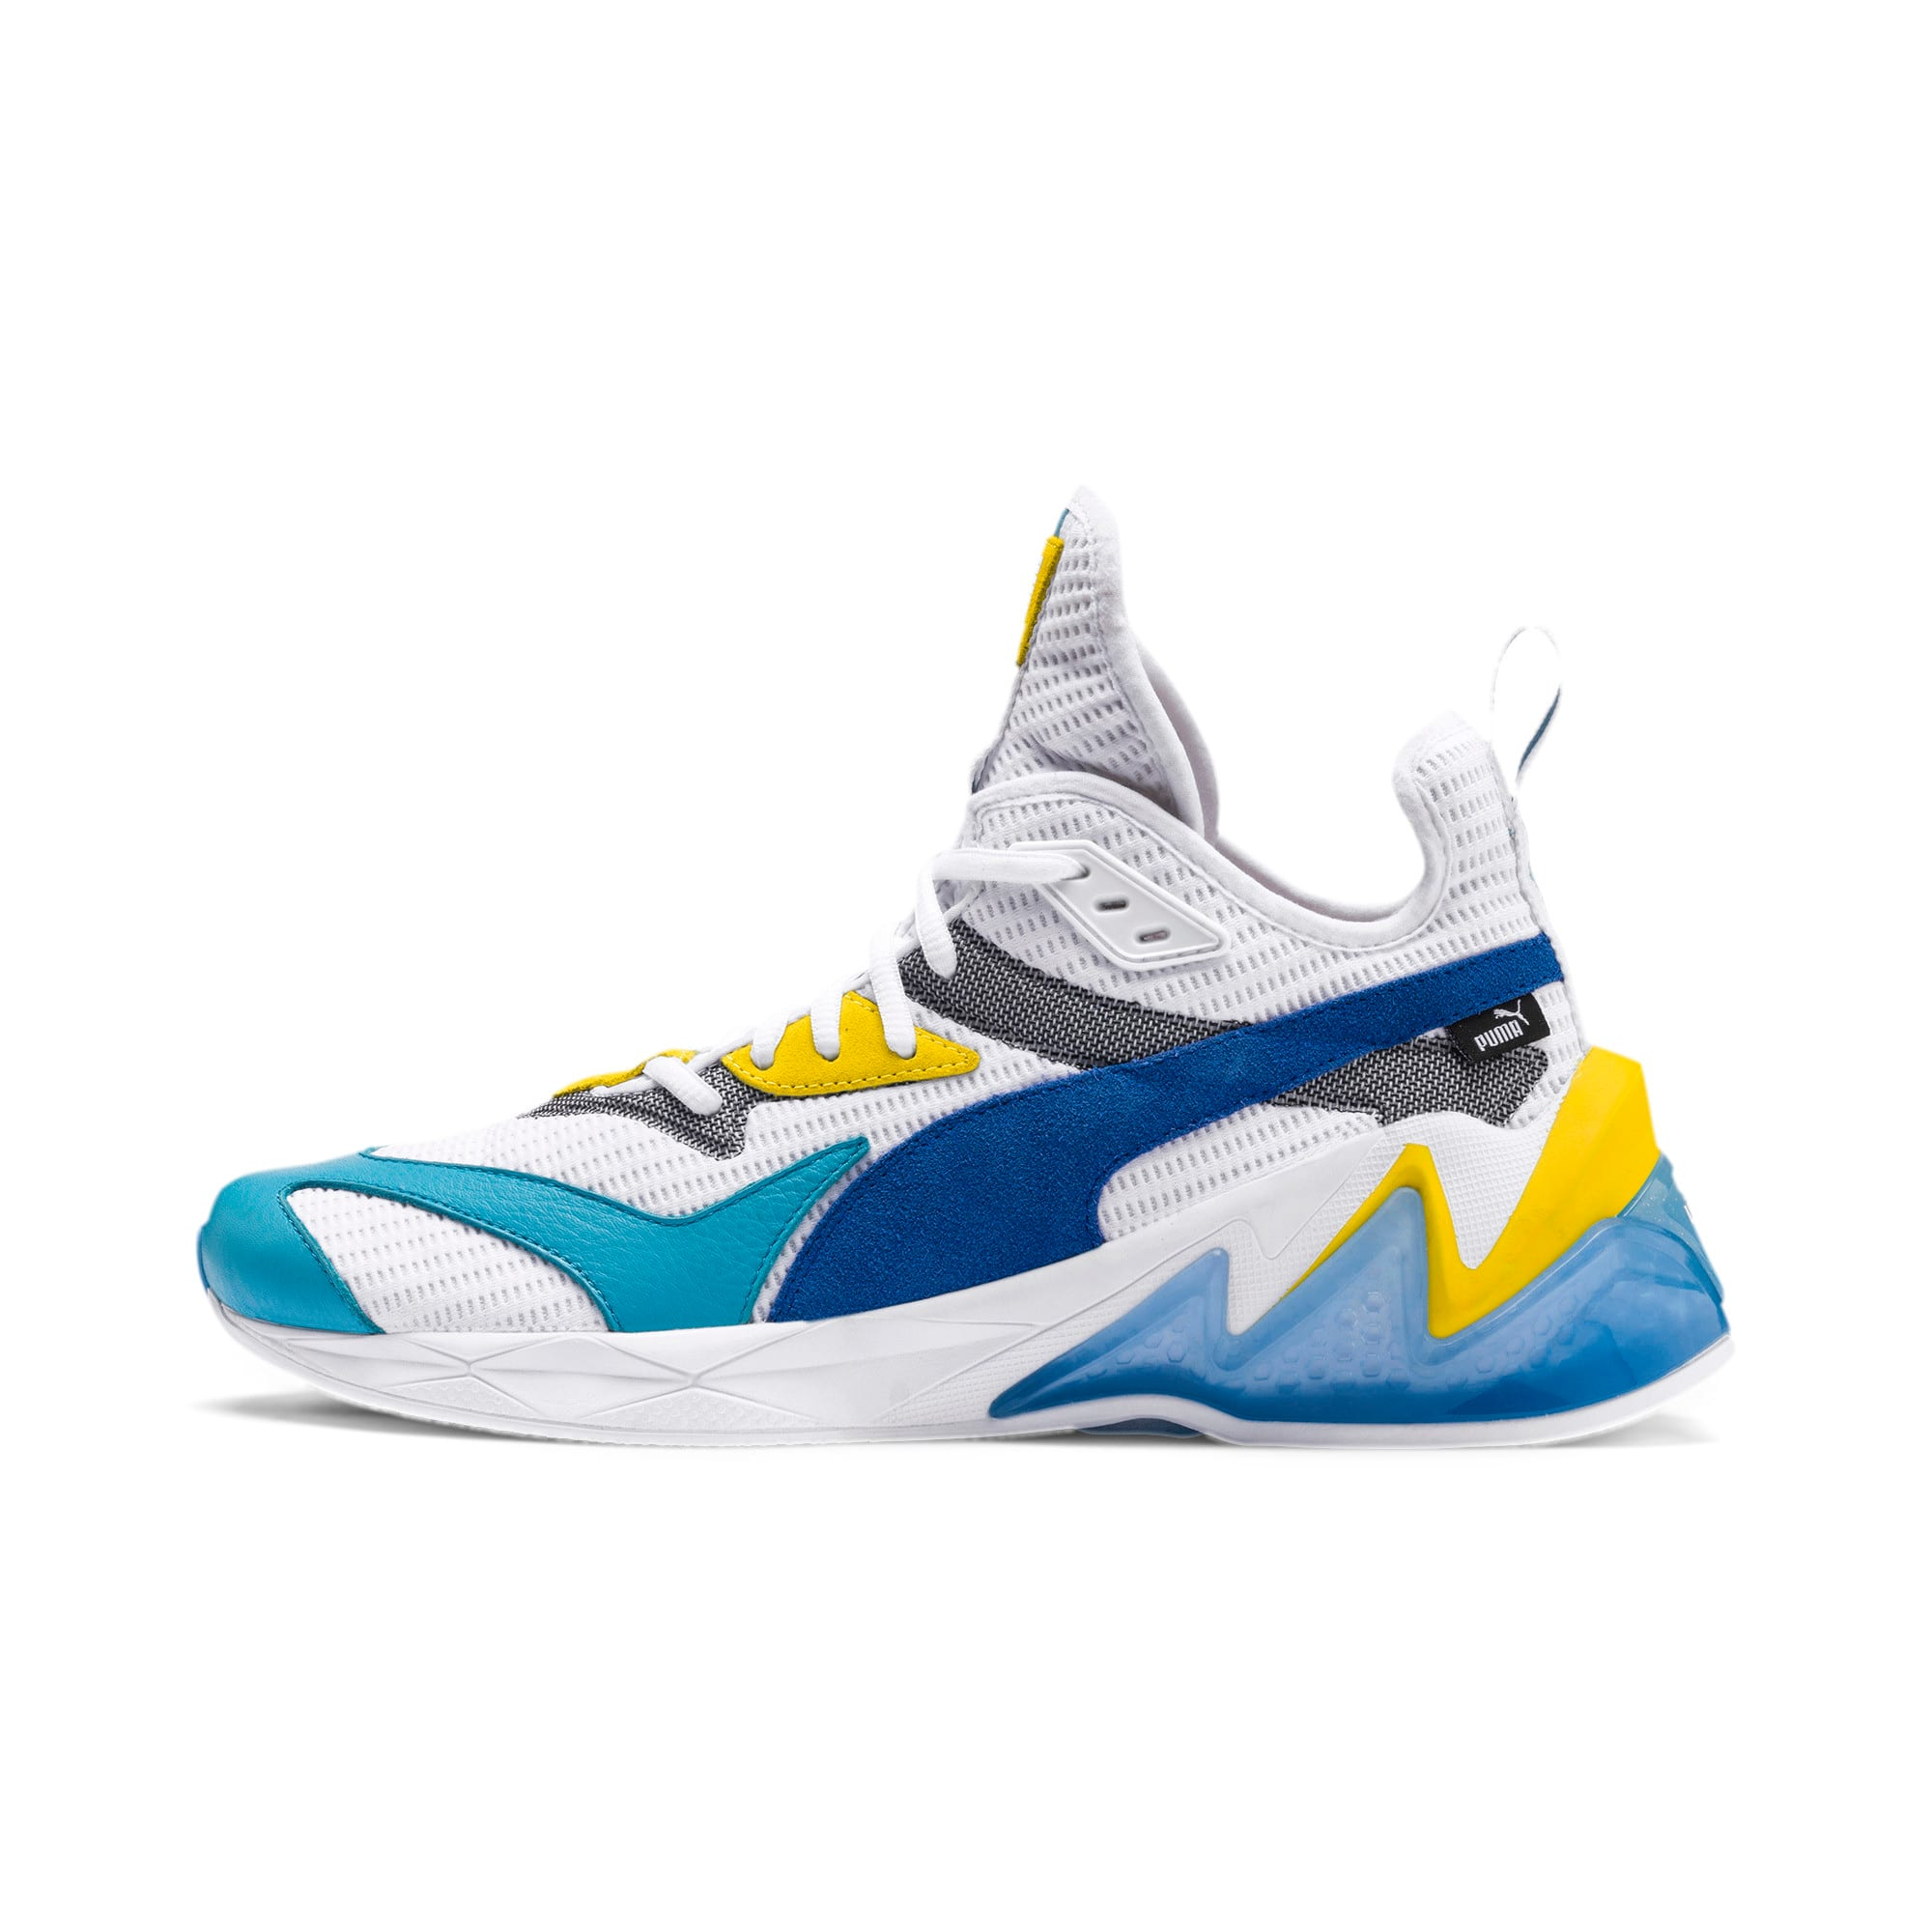 Thumbnail 1 of LQDCELL Origin Men's Training Shoes, Puma White-B Blue-Blz Yellow, medium